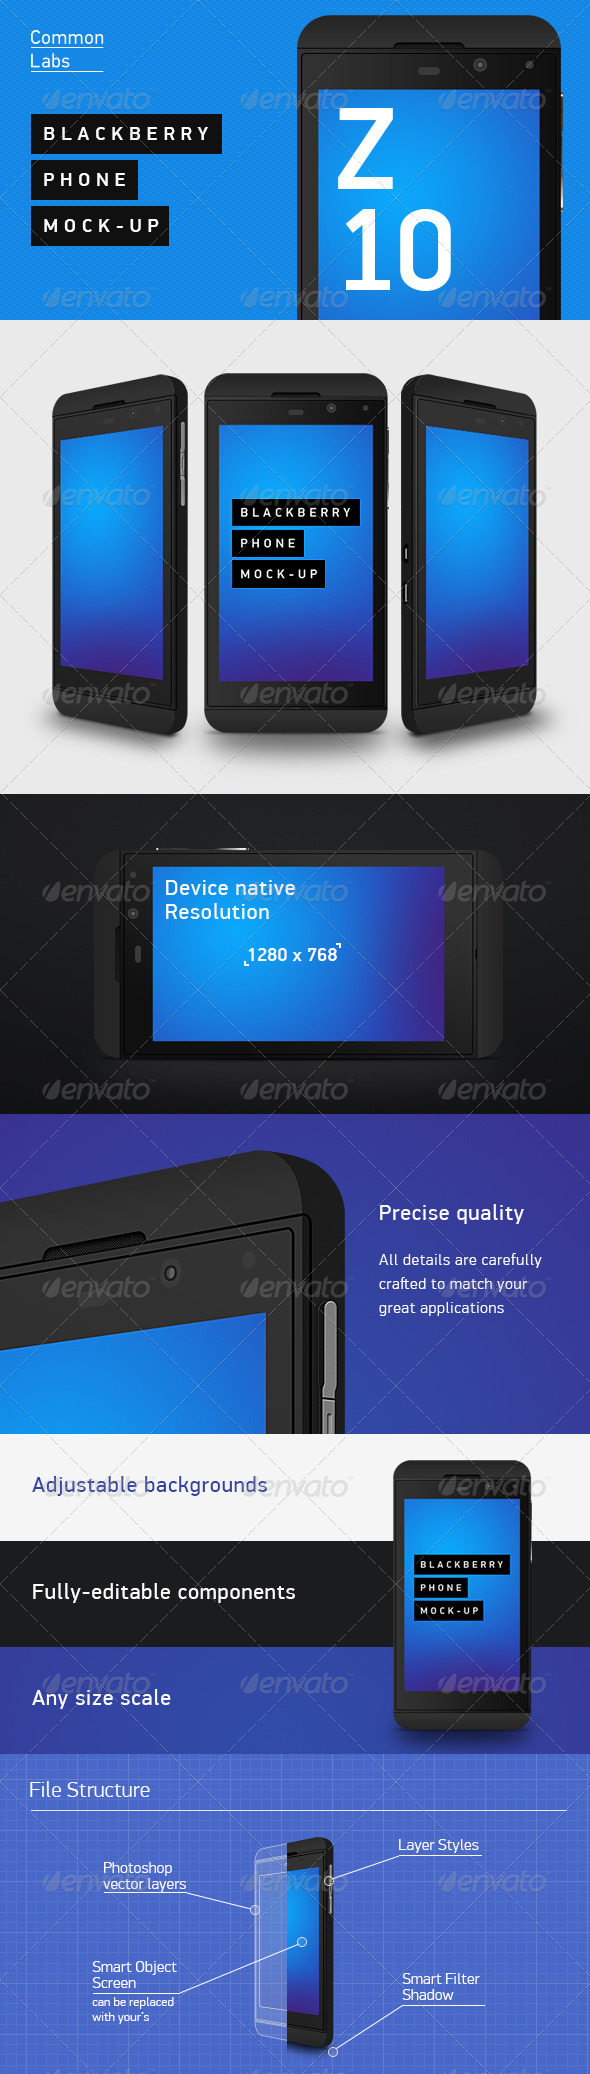 Blackberry Z10 Phone Mock-Up - Mobile Displays